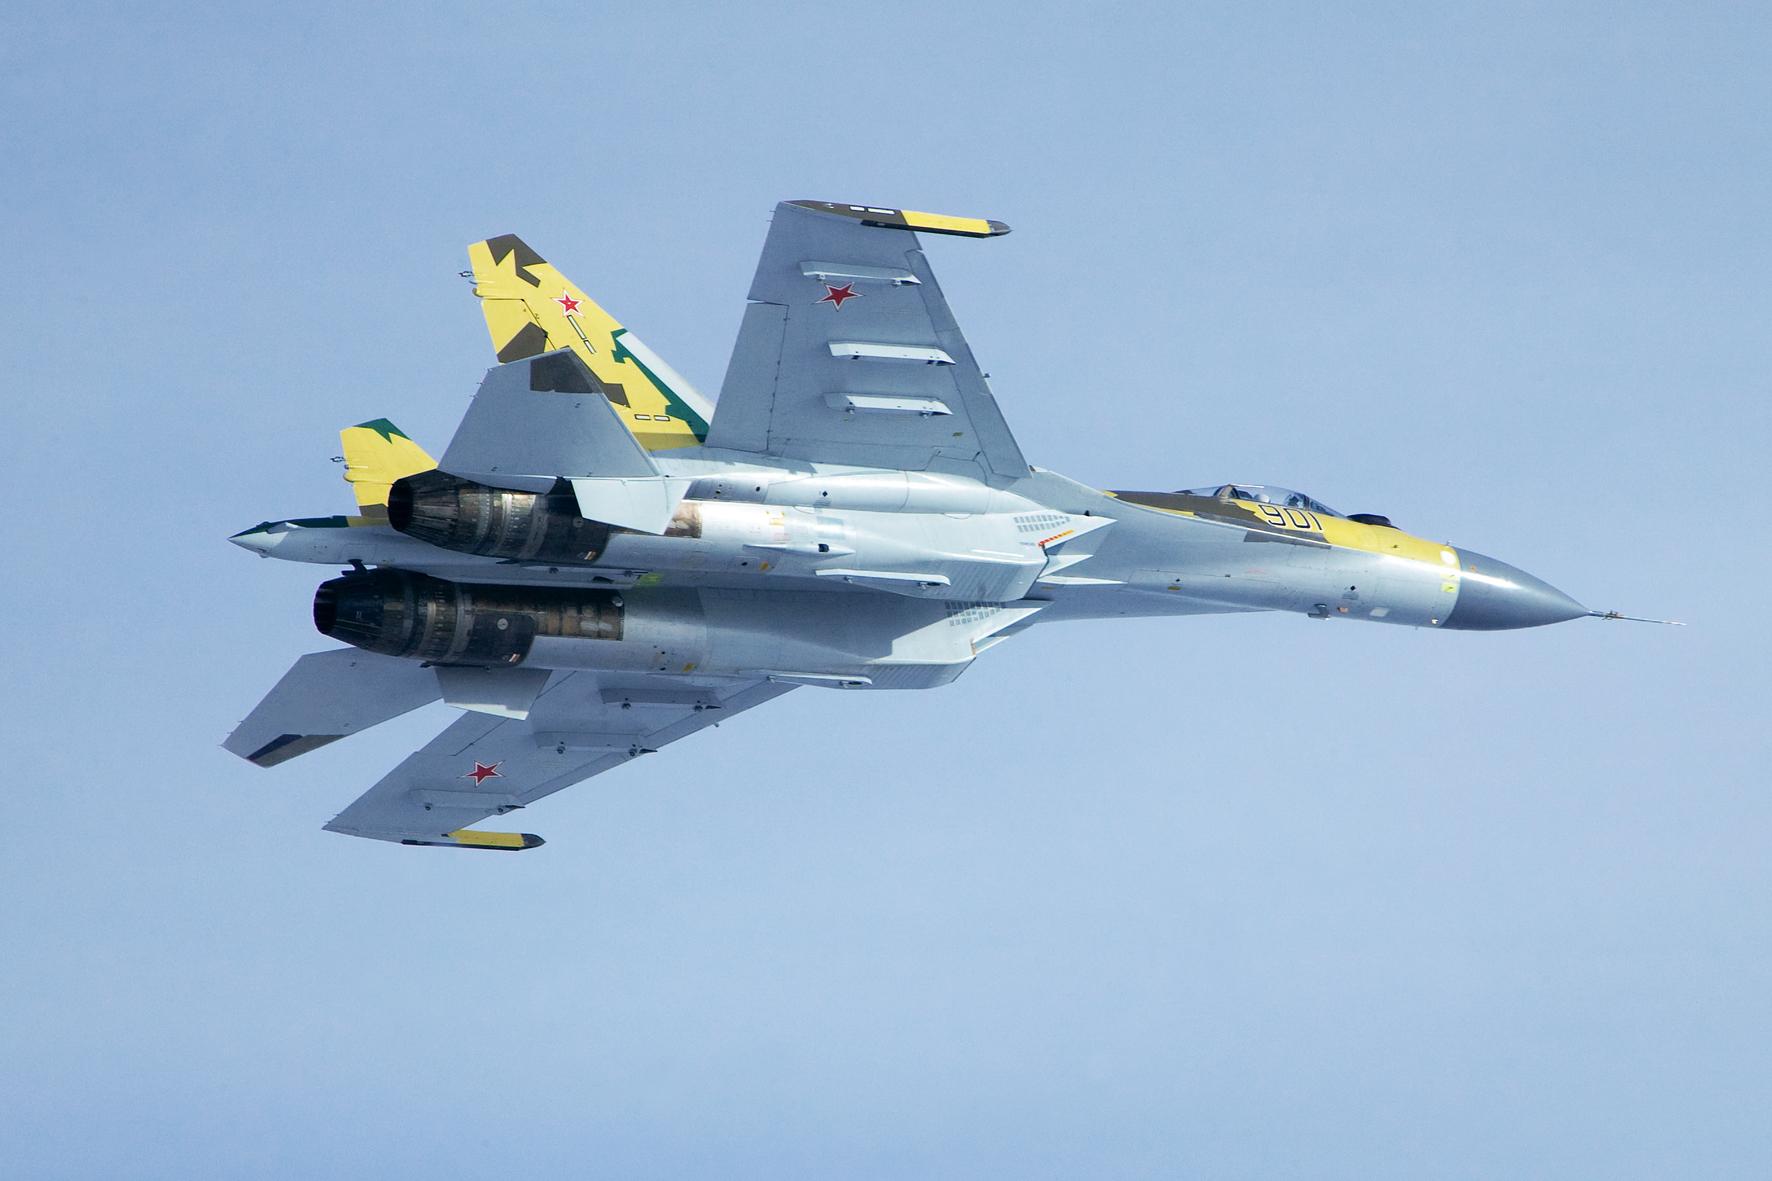 Rusia dikabarkan hendak menandatangani kontrak pengiriman sepuluh unit jet tempur multiperan Su-35 kepada Indonesia.